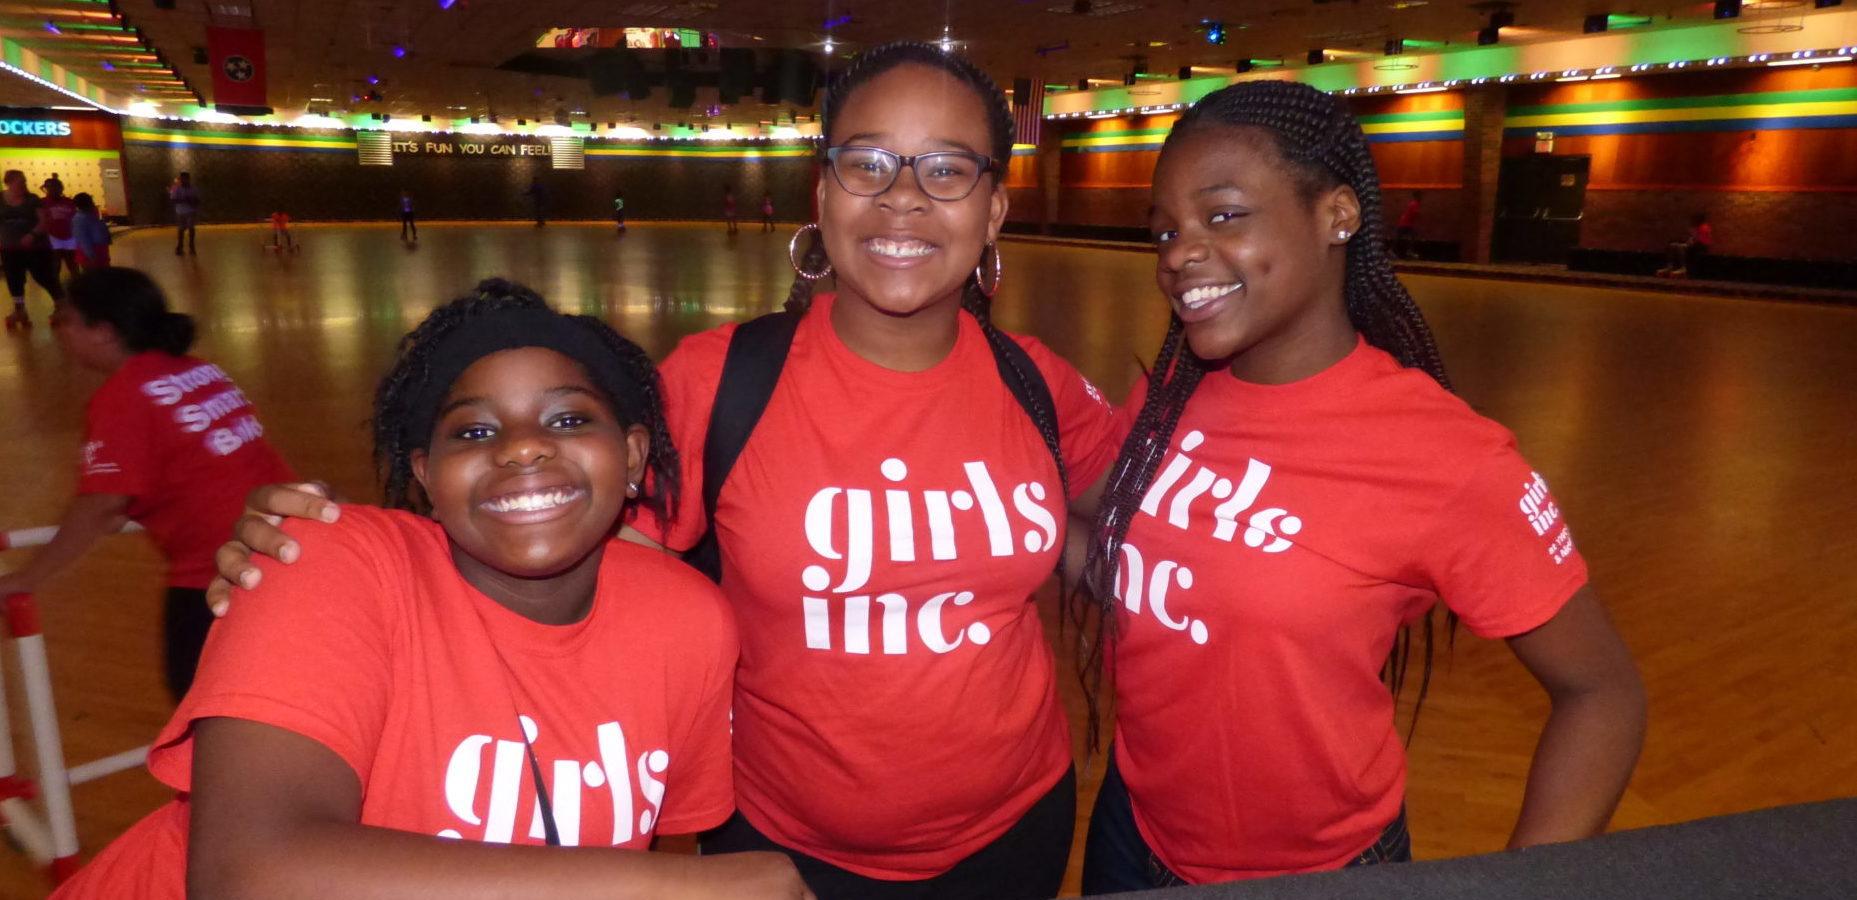 Girls Inc. At Ywca Nashville - Ywca Nashville & Middle Within Middle Early College Nashville Spring Break